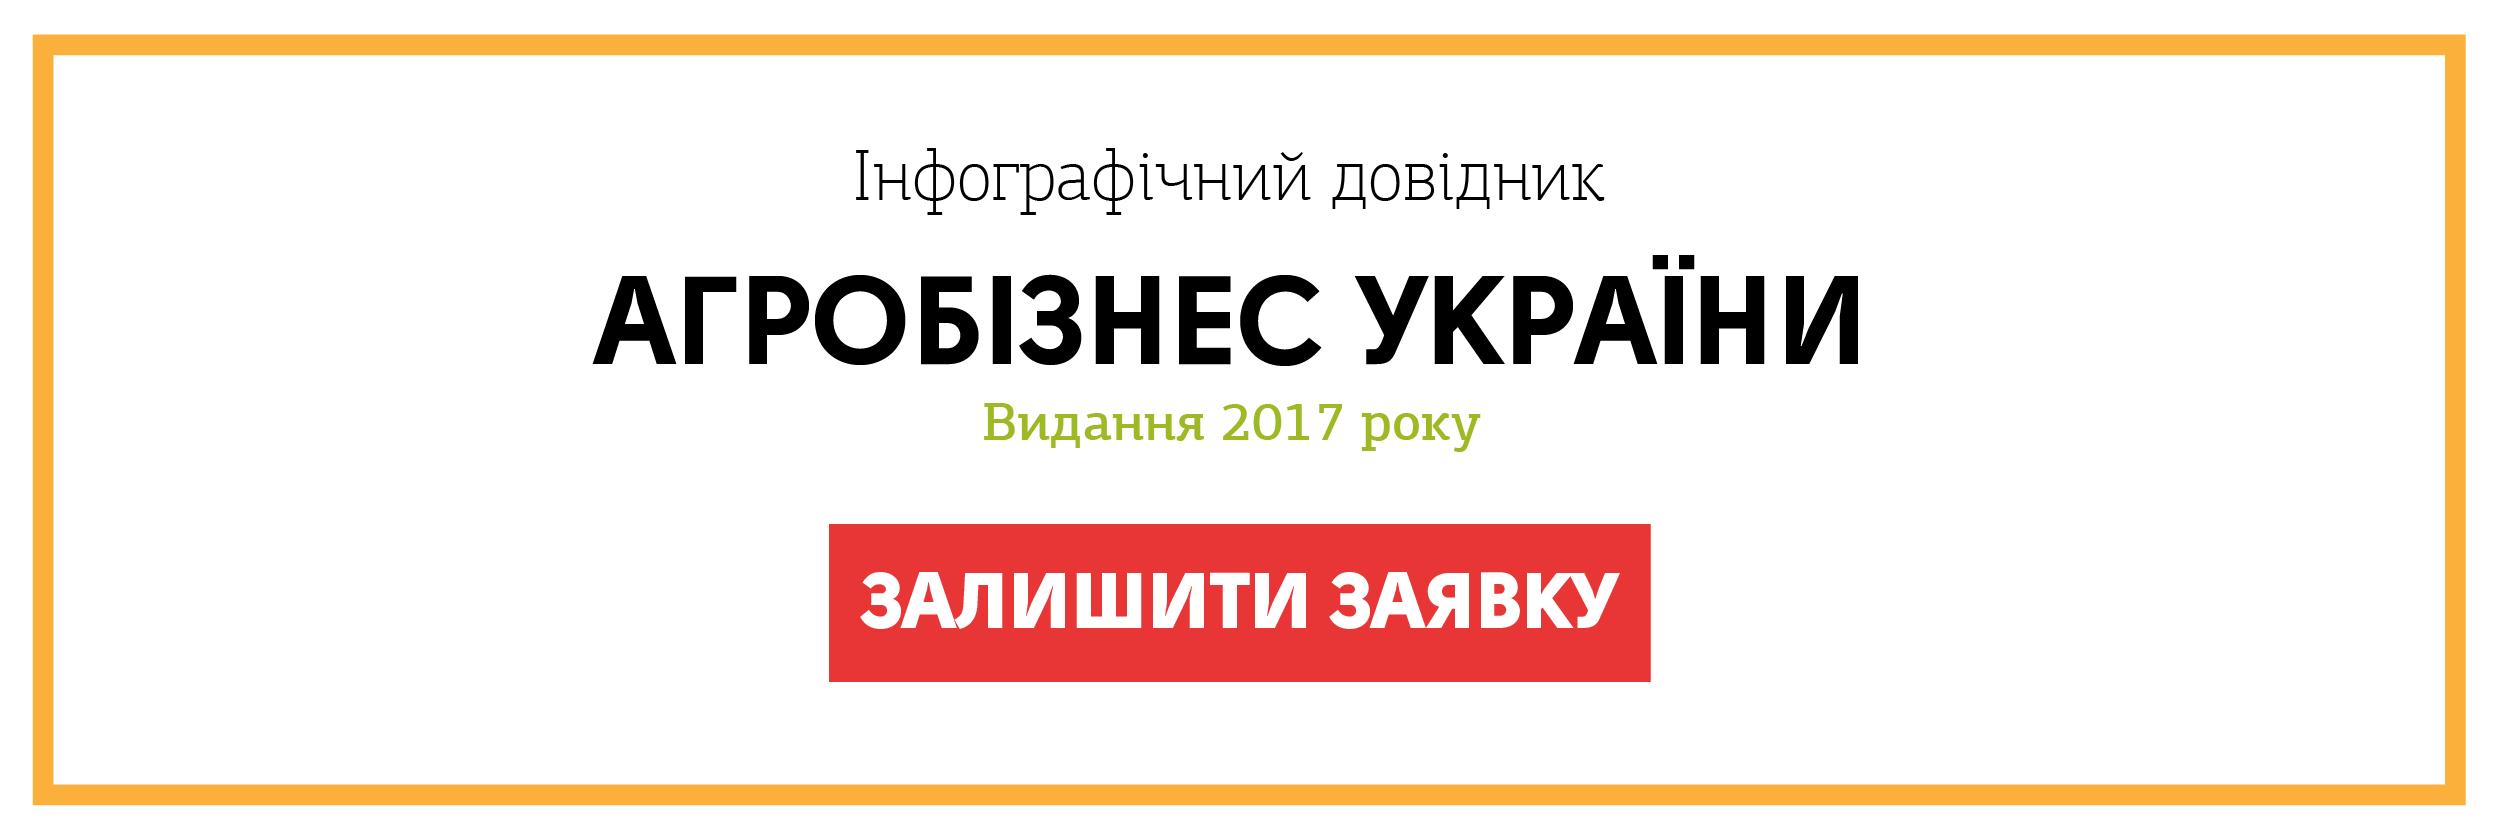 Агробізнес України